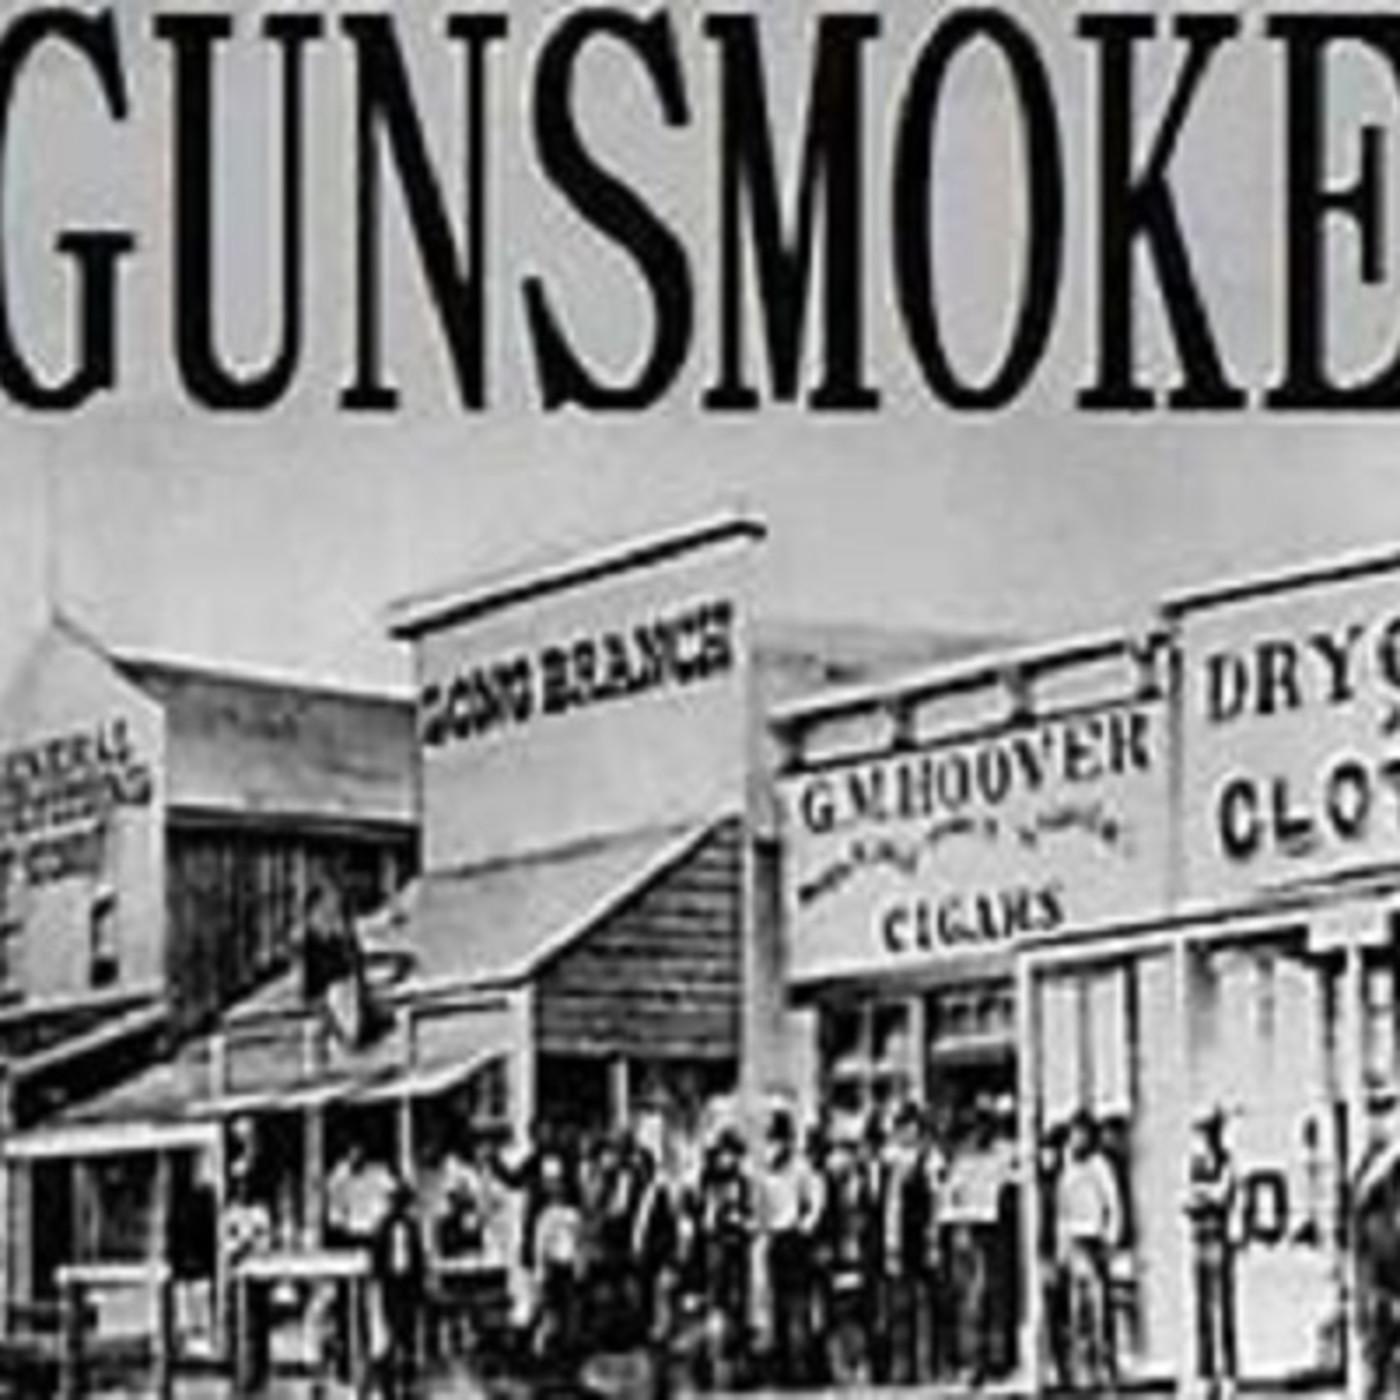 Gunsmoke 61-05-28 (477) The Sod-Buster